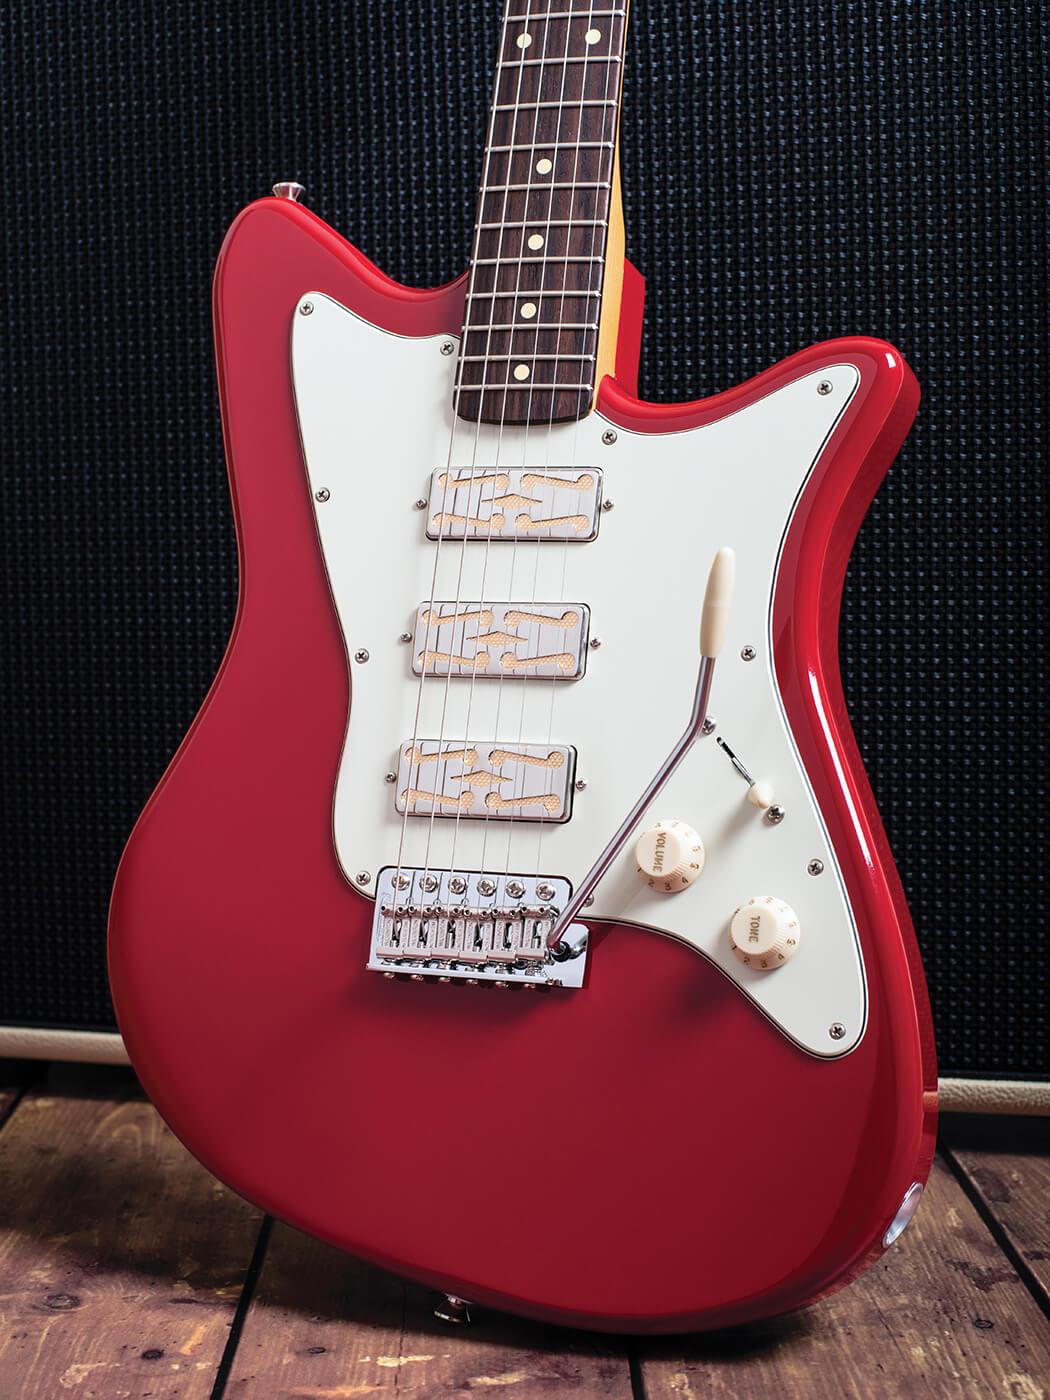 K-Line Guitars